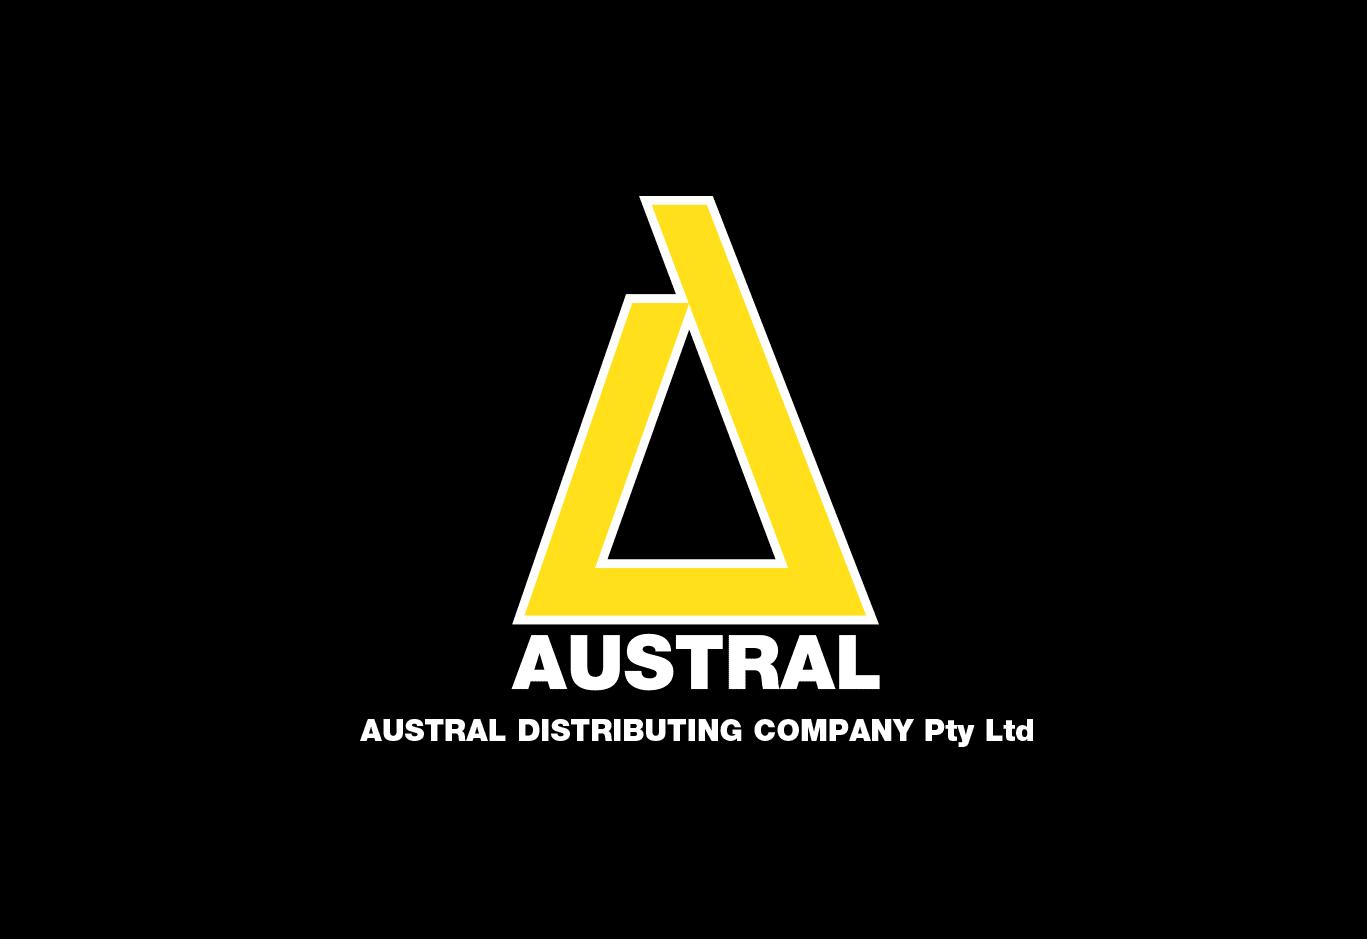 Austral Dist Rev